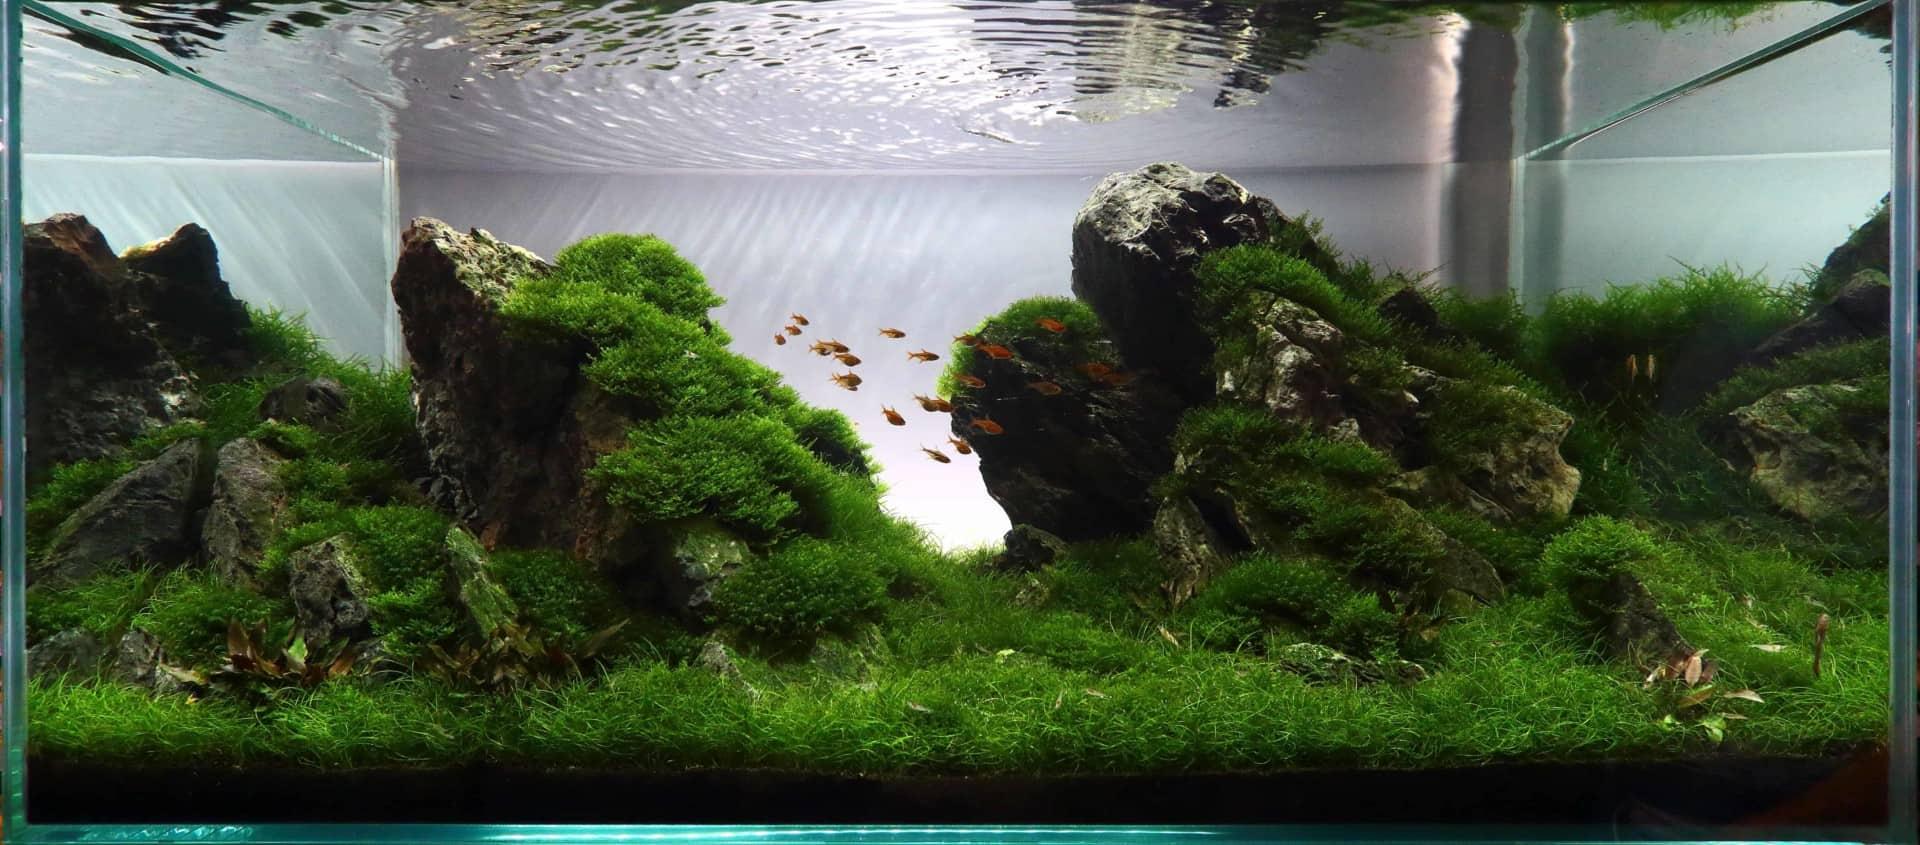 175 Riccia fluitans - Das schwimmende Teichlebermoos 13